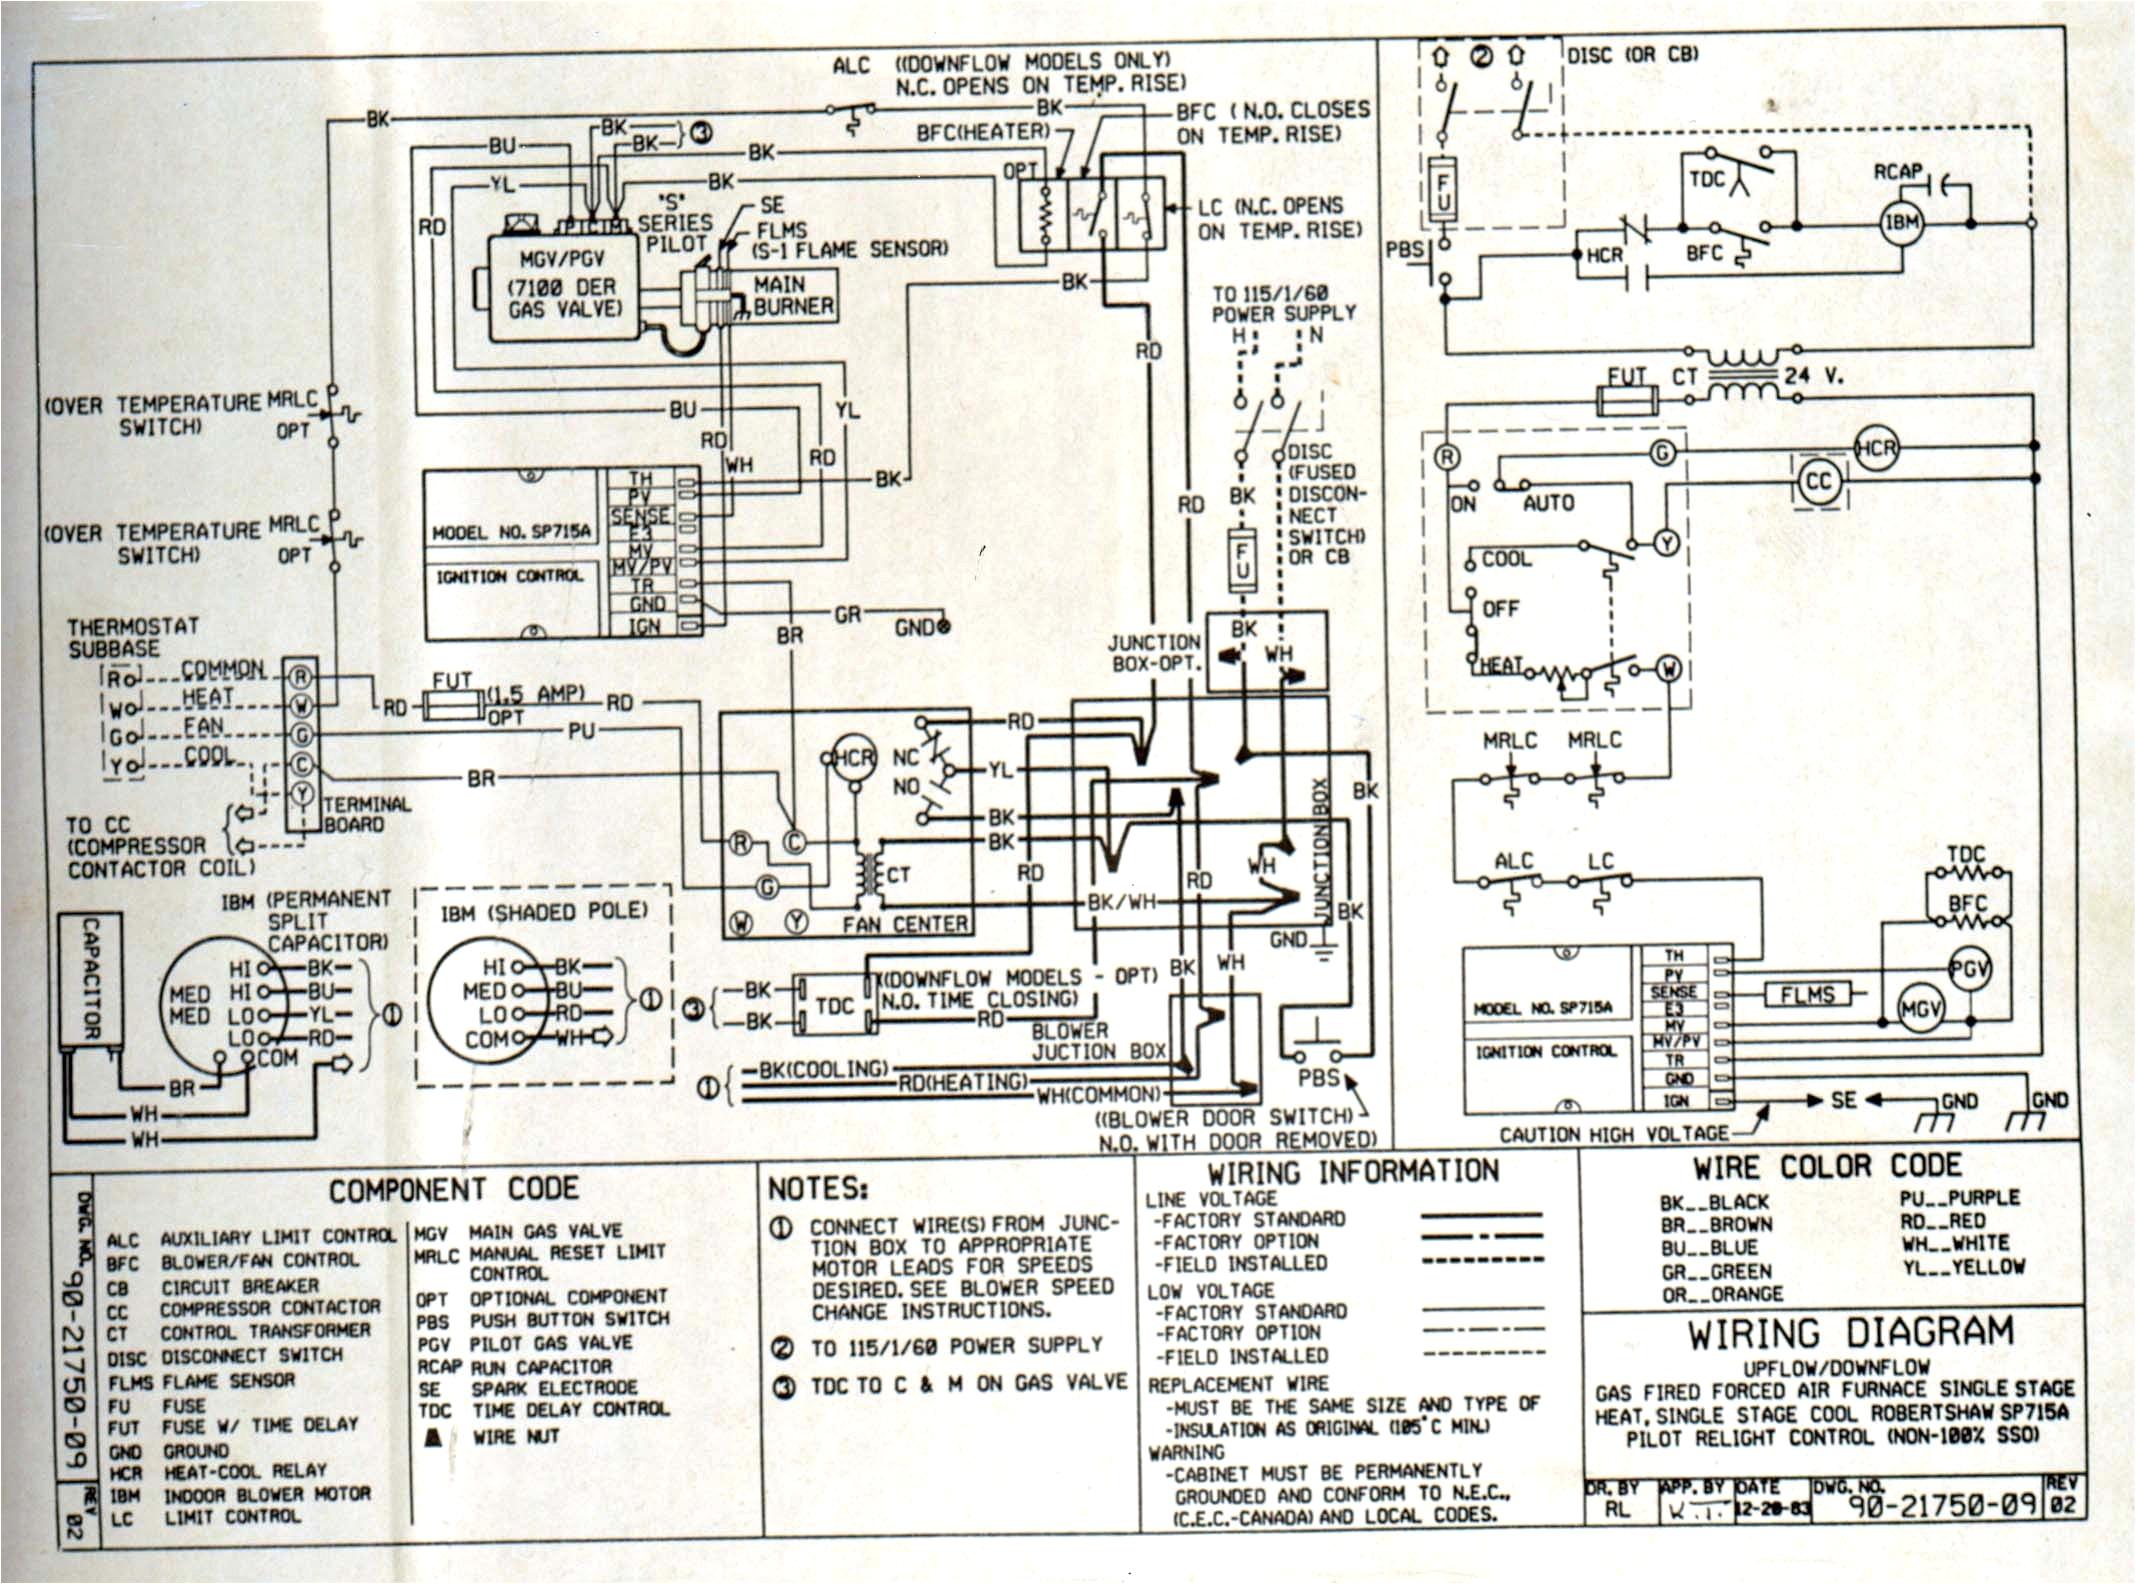 tractor dynamo wiring diagram new massey ferguson 135 wiring diagram alternator unique massey ferguson